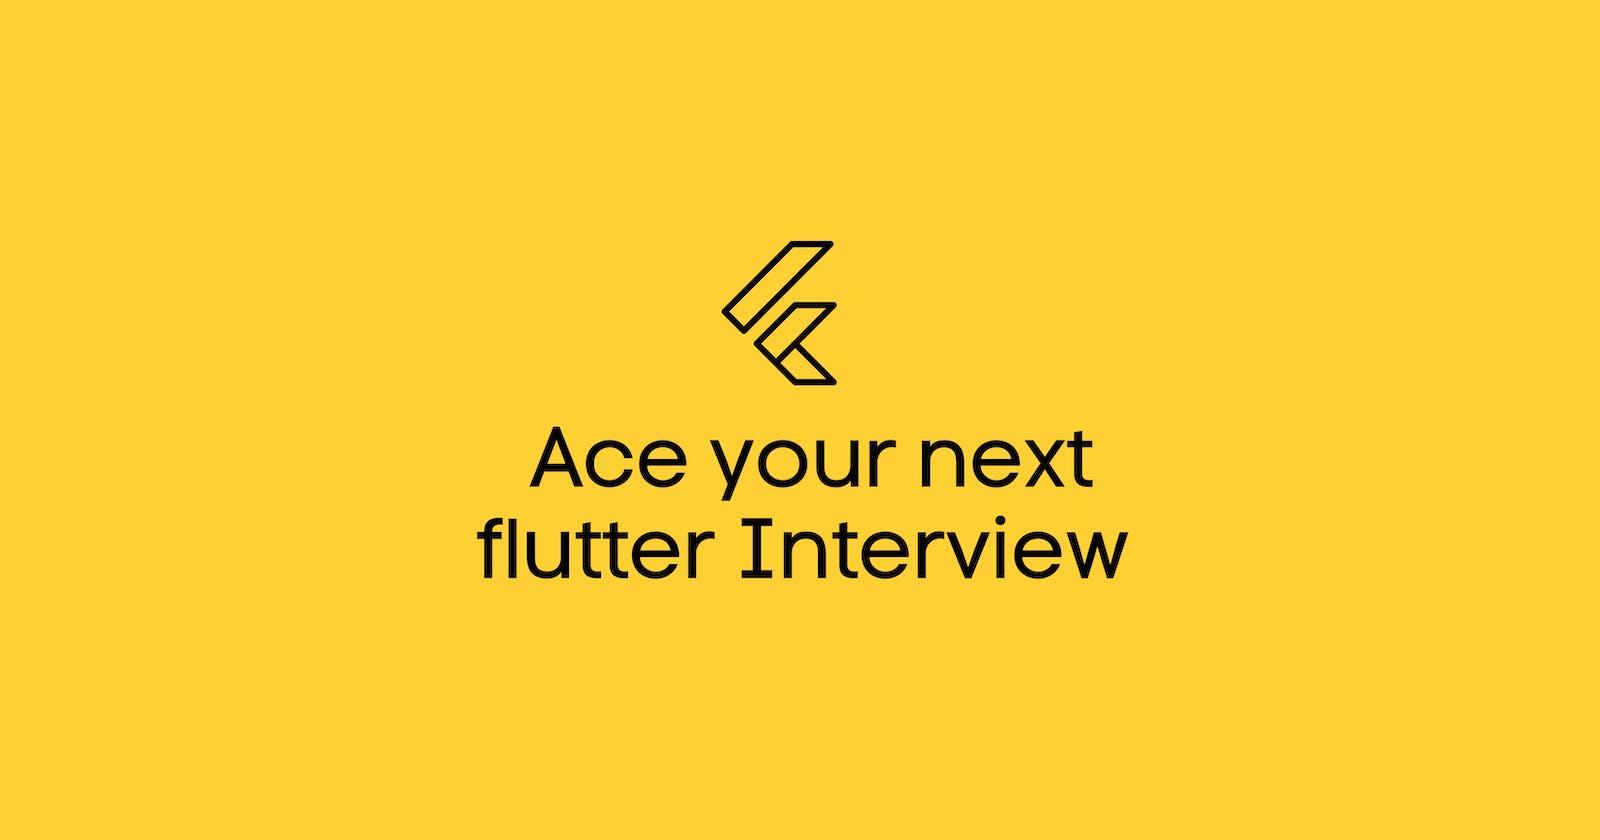 Ace your next flutter Interview